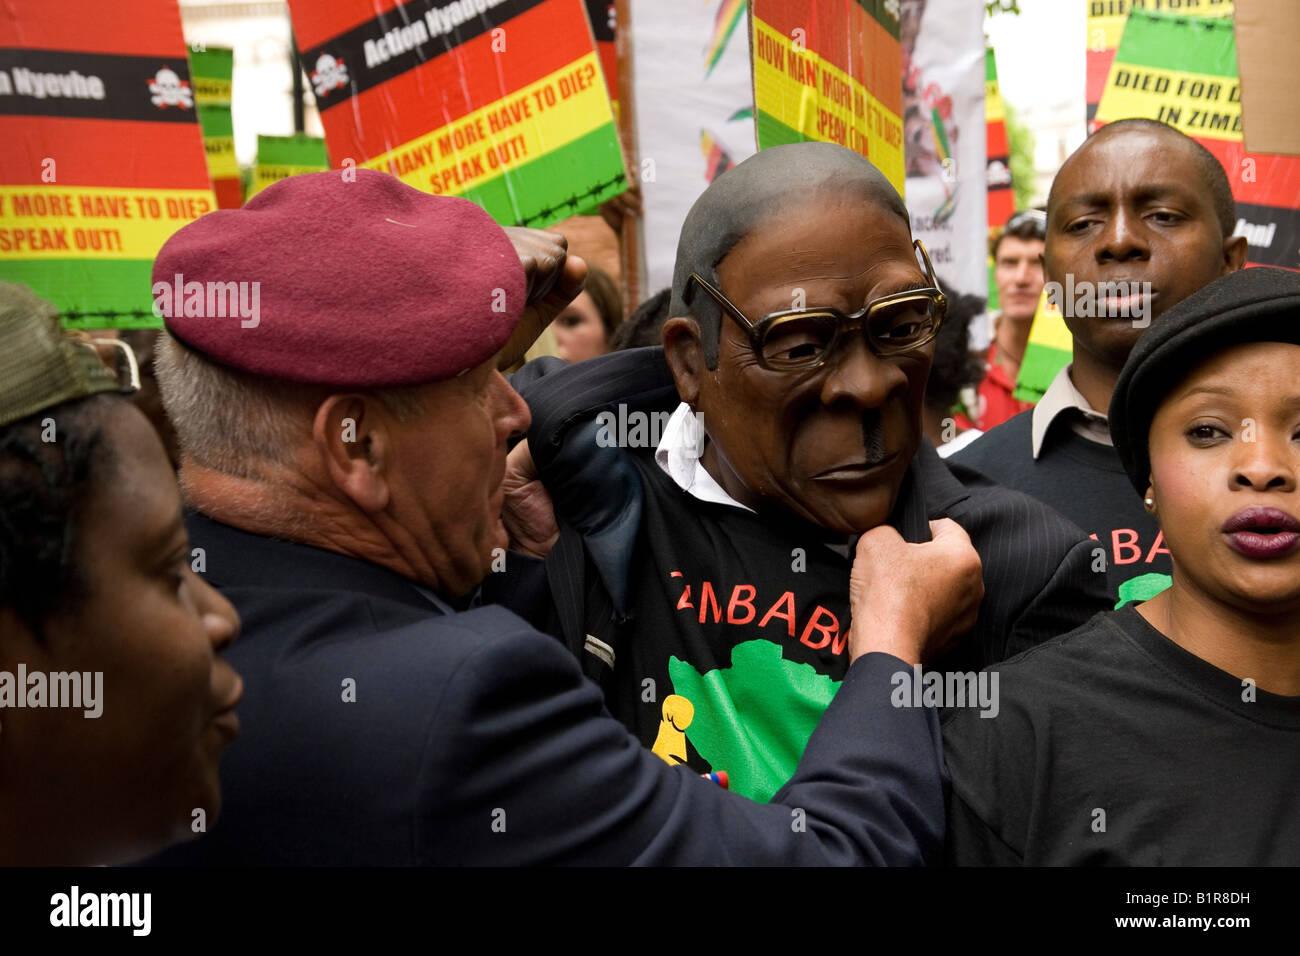 Anti Mugabe protesters grab man in Mugabe mask outside South Africa House London - Stock Image